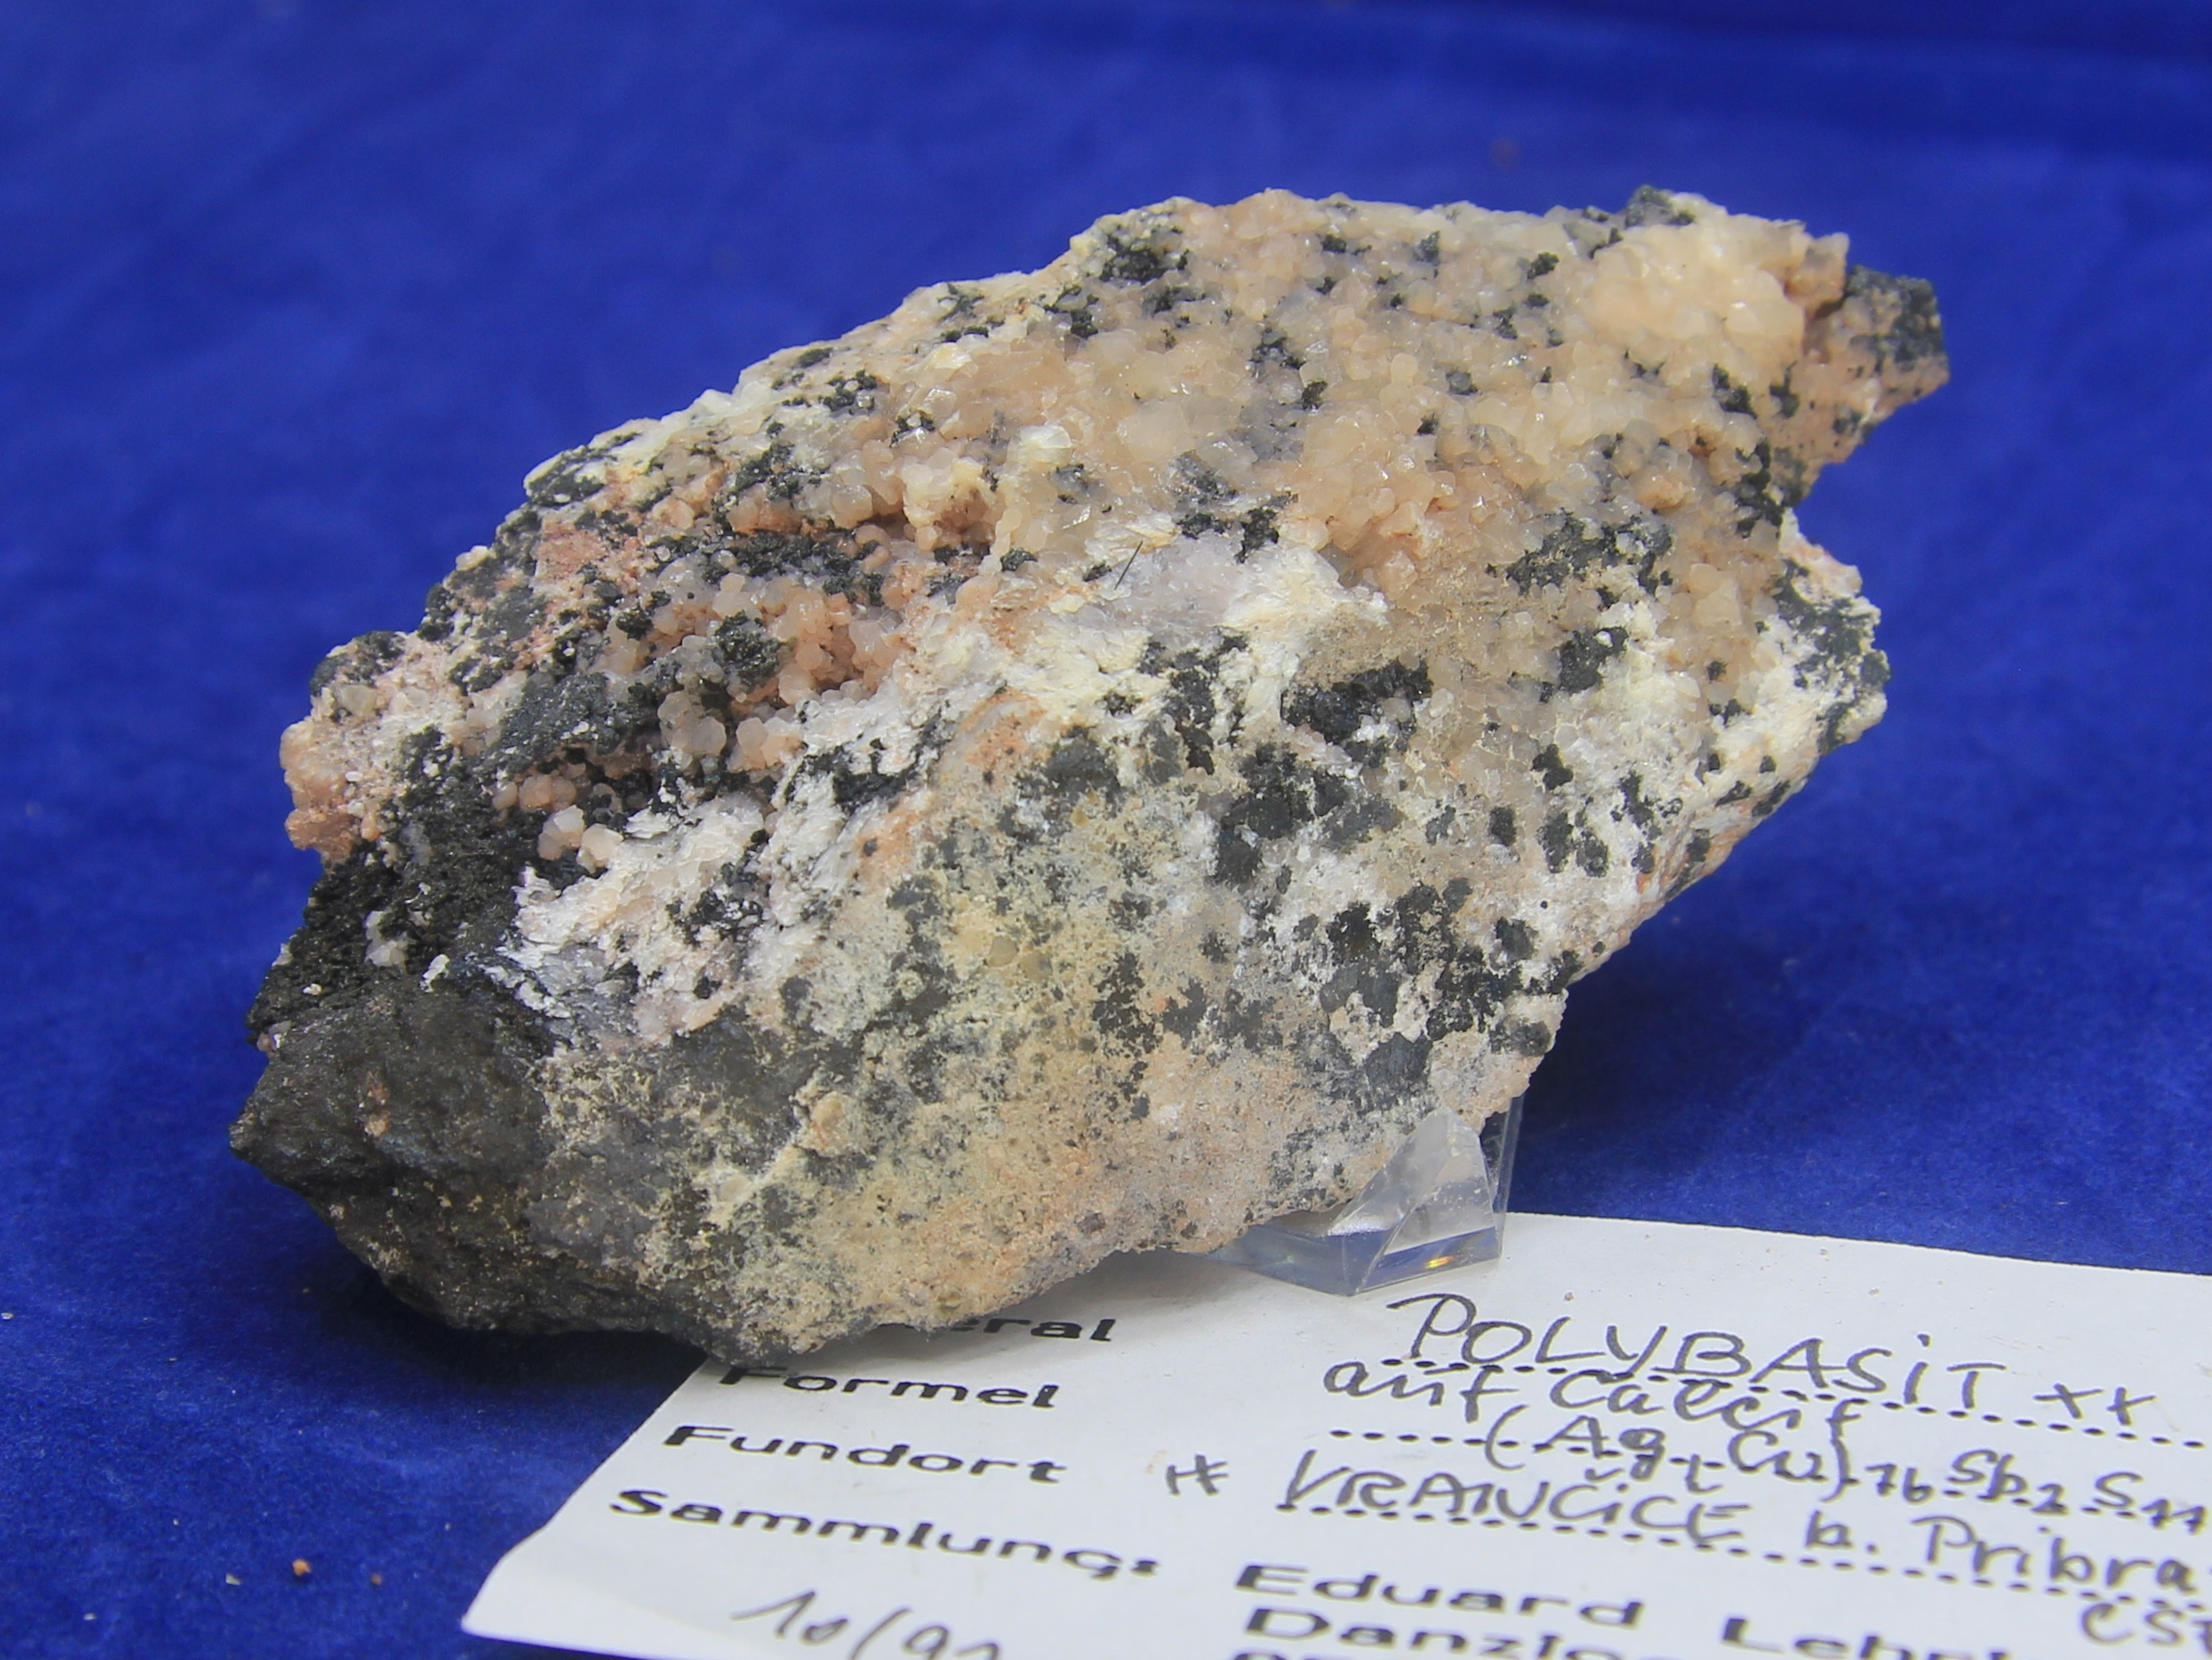 Polybasite on a calcite matrix